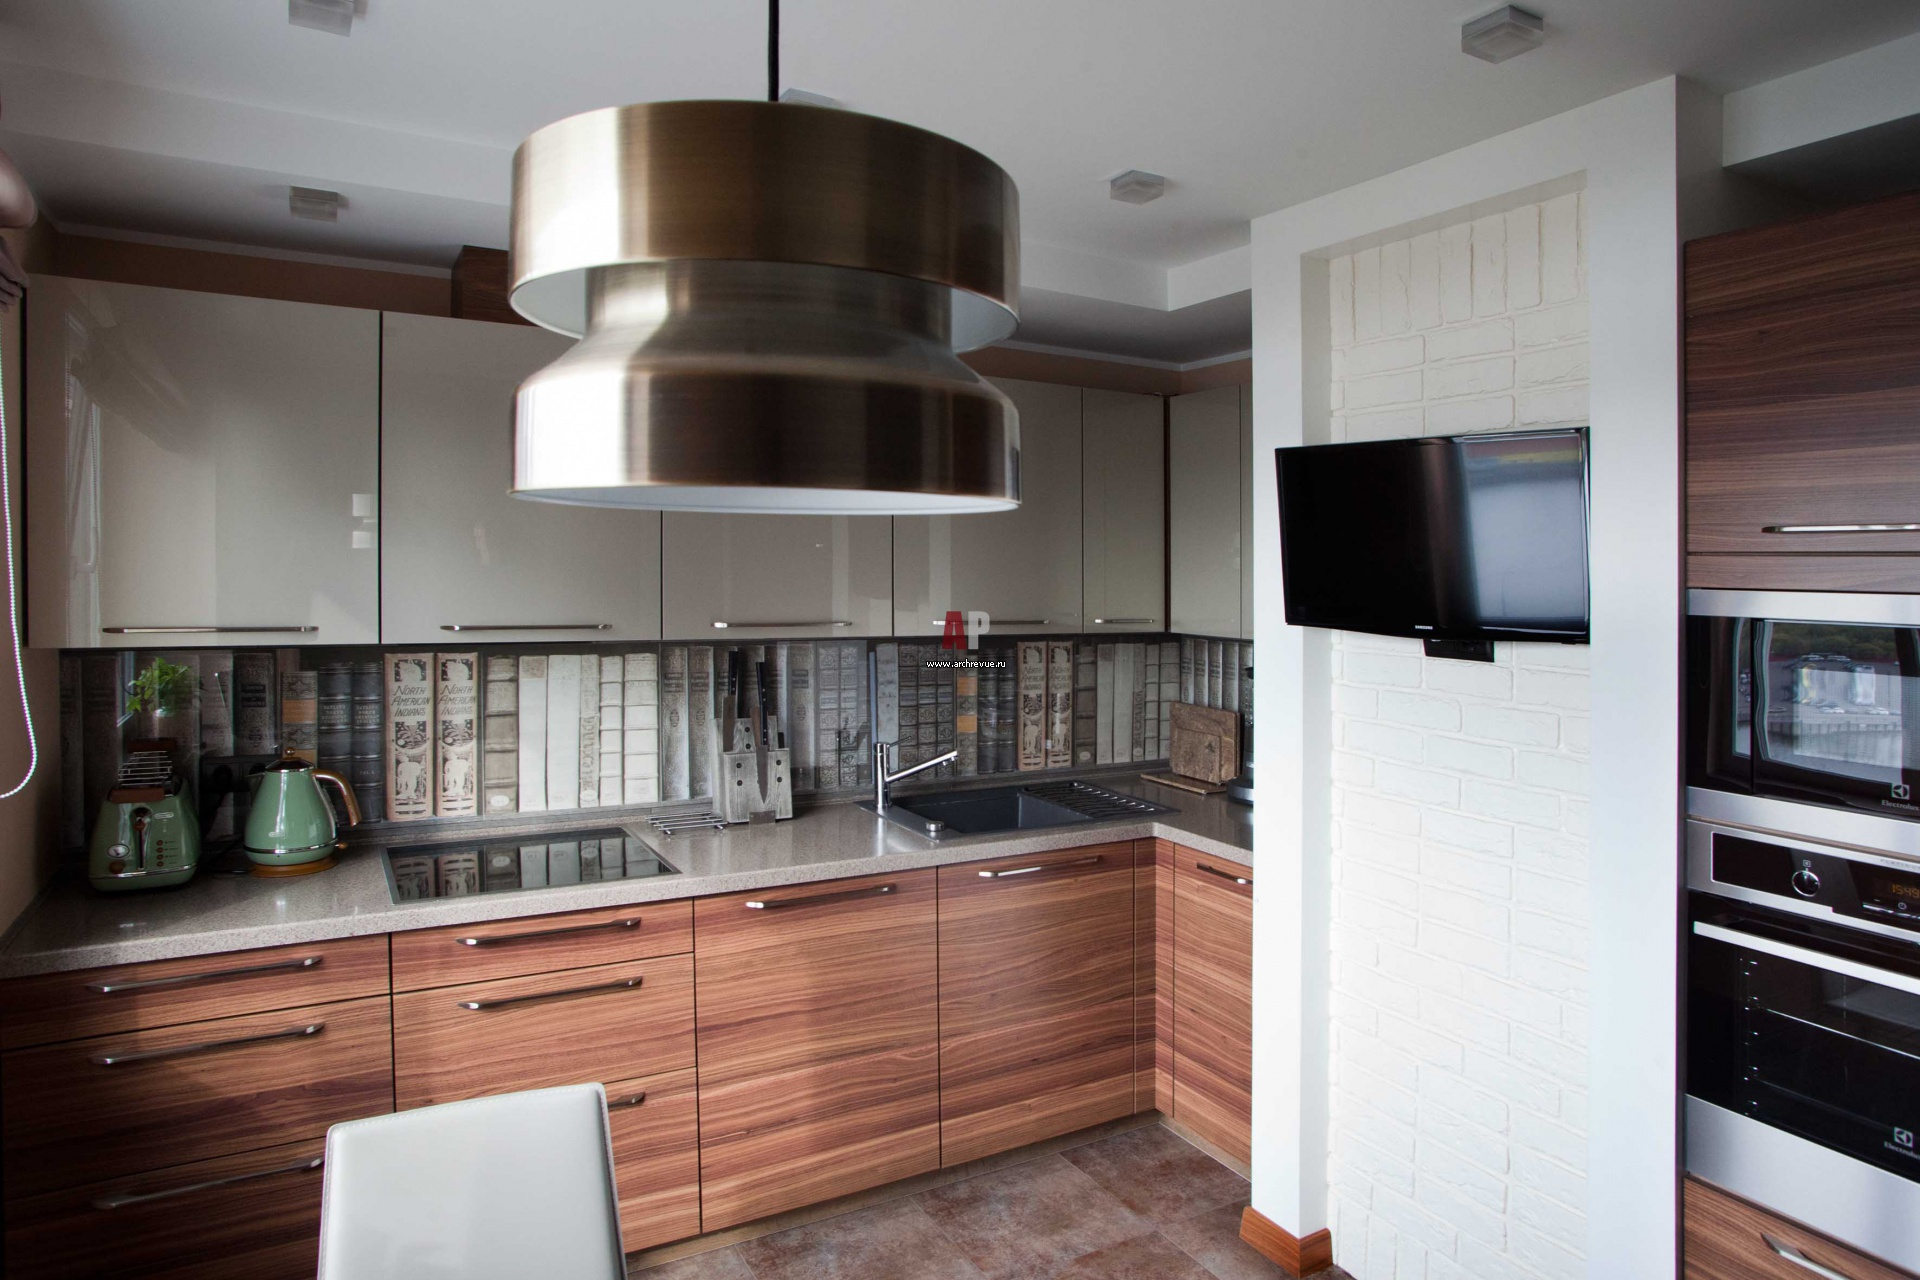 Кухня 78 кв м дизайн фото